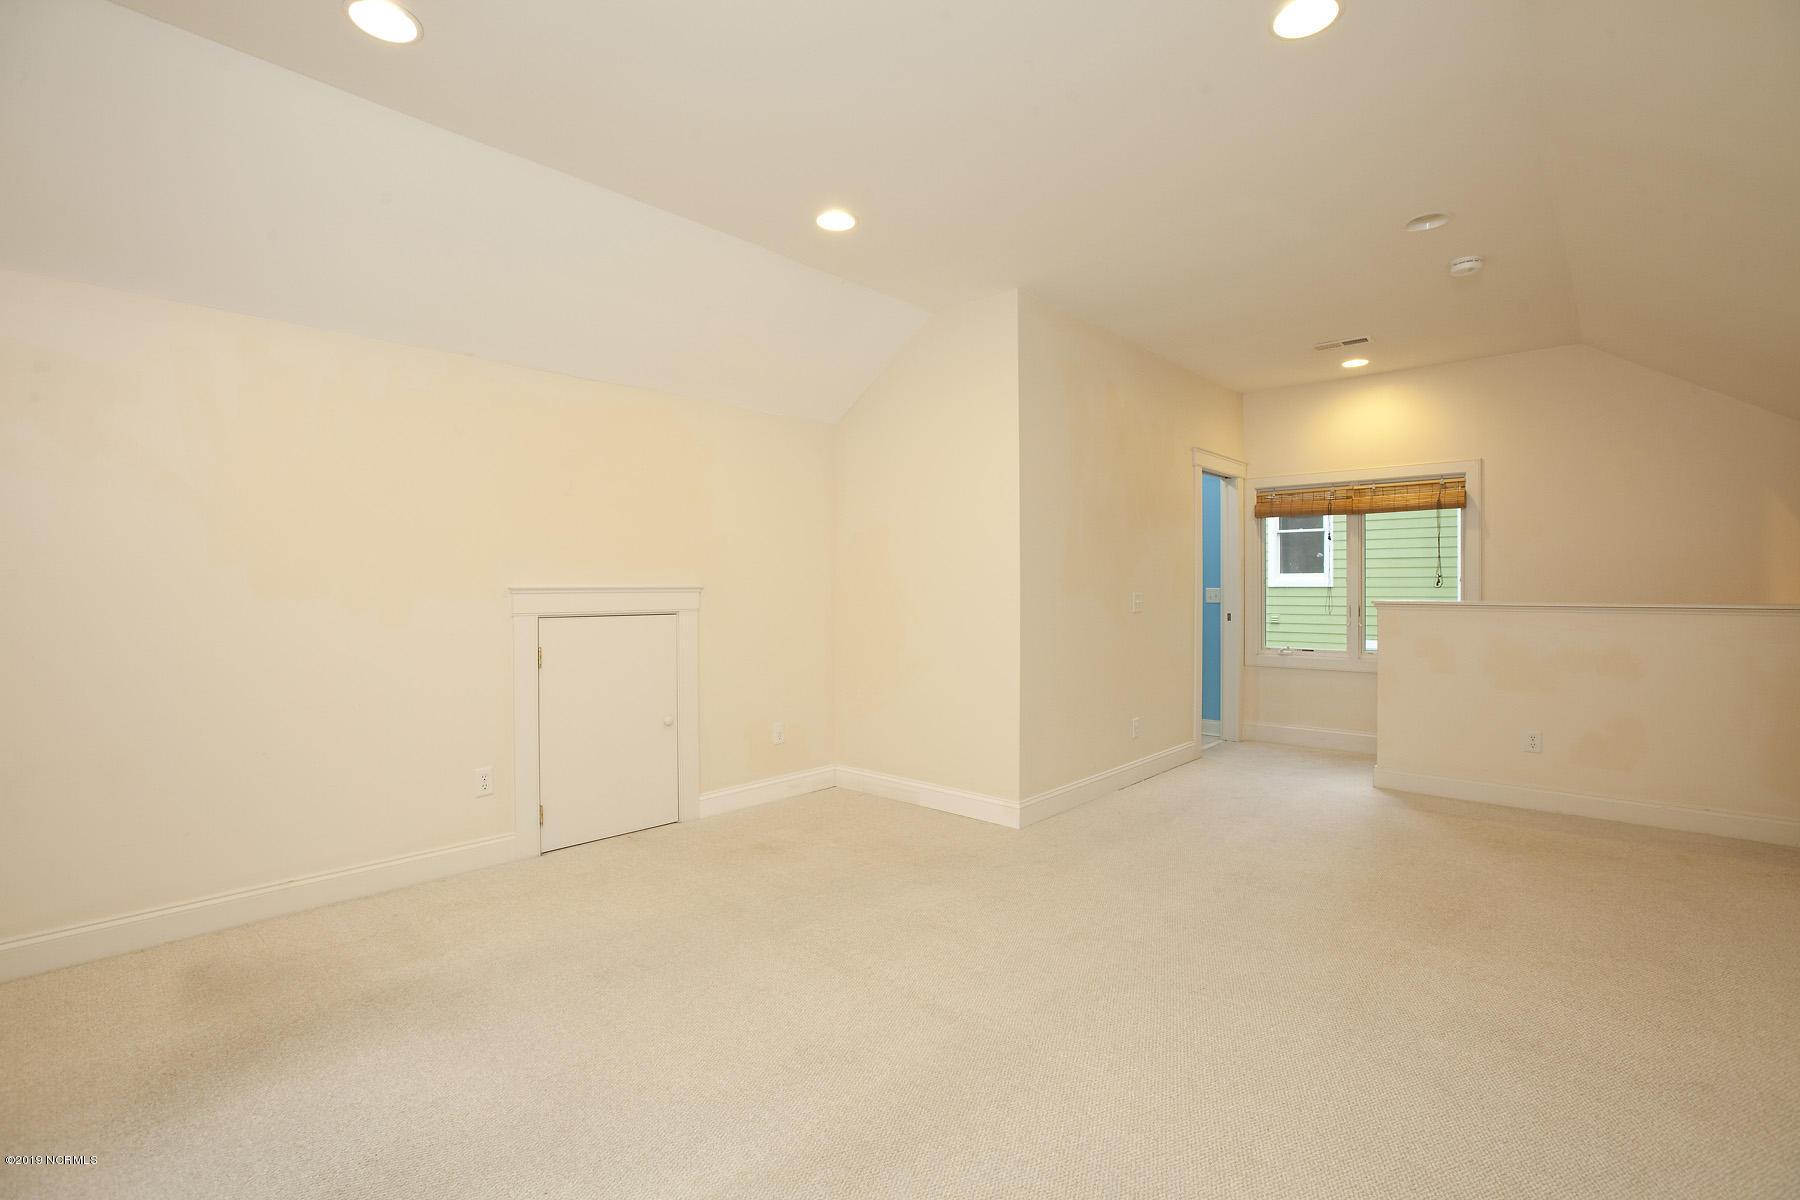 8021 Reunion Road, Wilmington, North Carolina 28411, 3 Bedrooms Bedrooms, 9 Rooms Rooms,4 BathroomsBathrooms,Residential,For Sale,Reunion,100189161